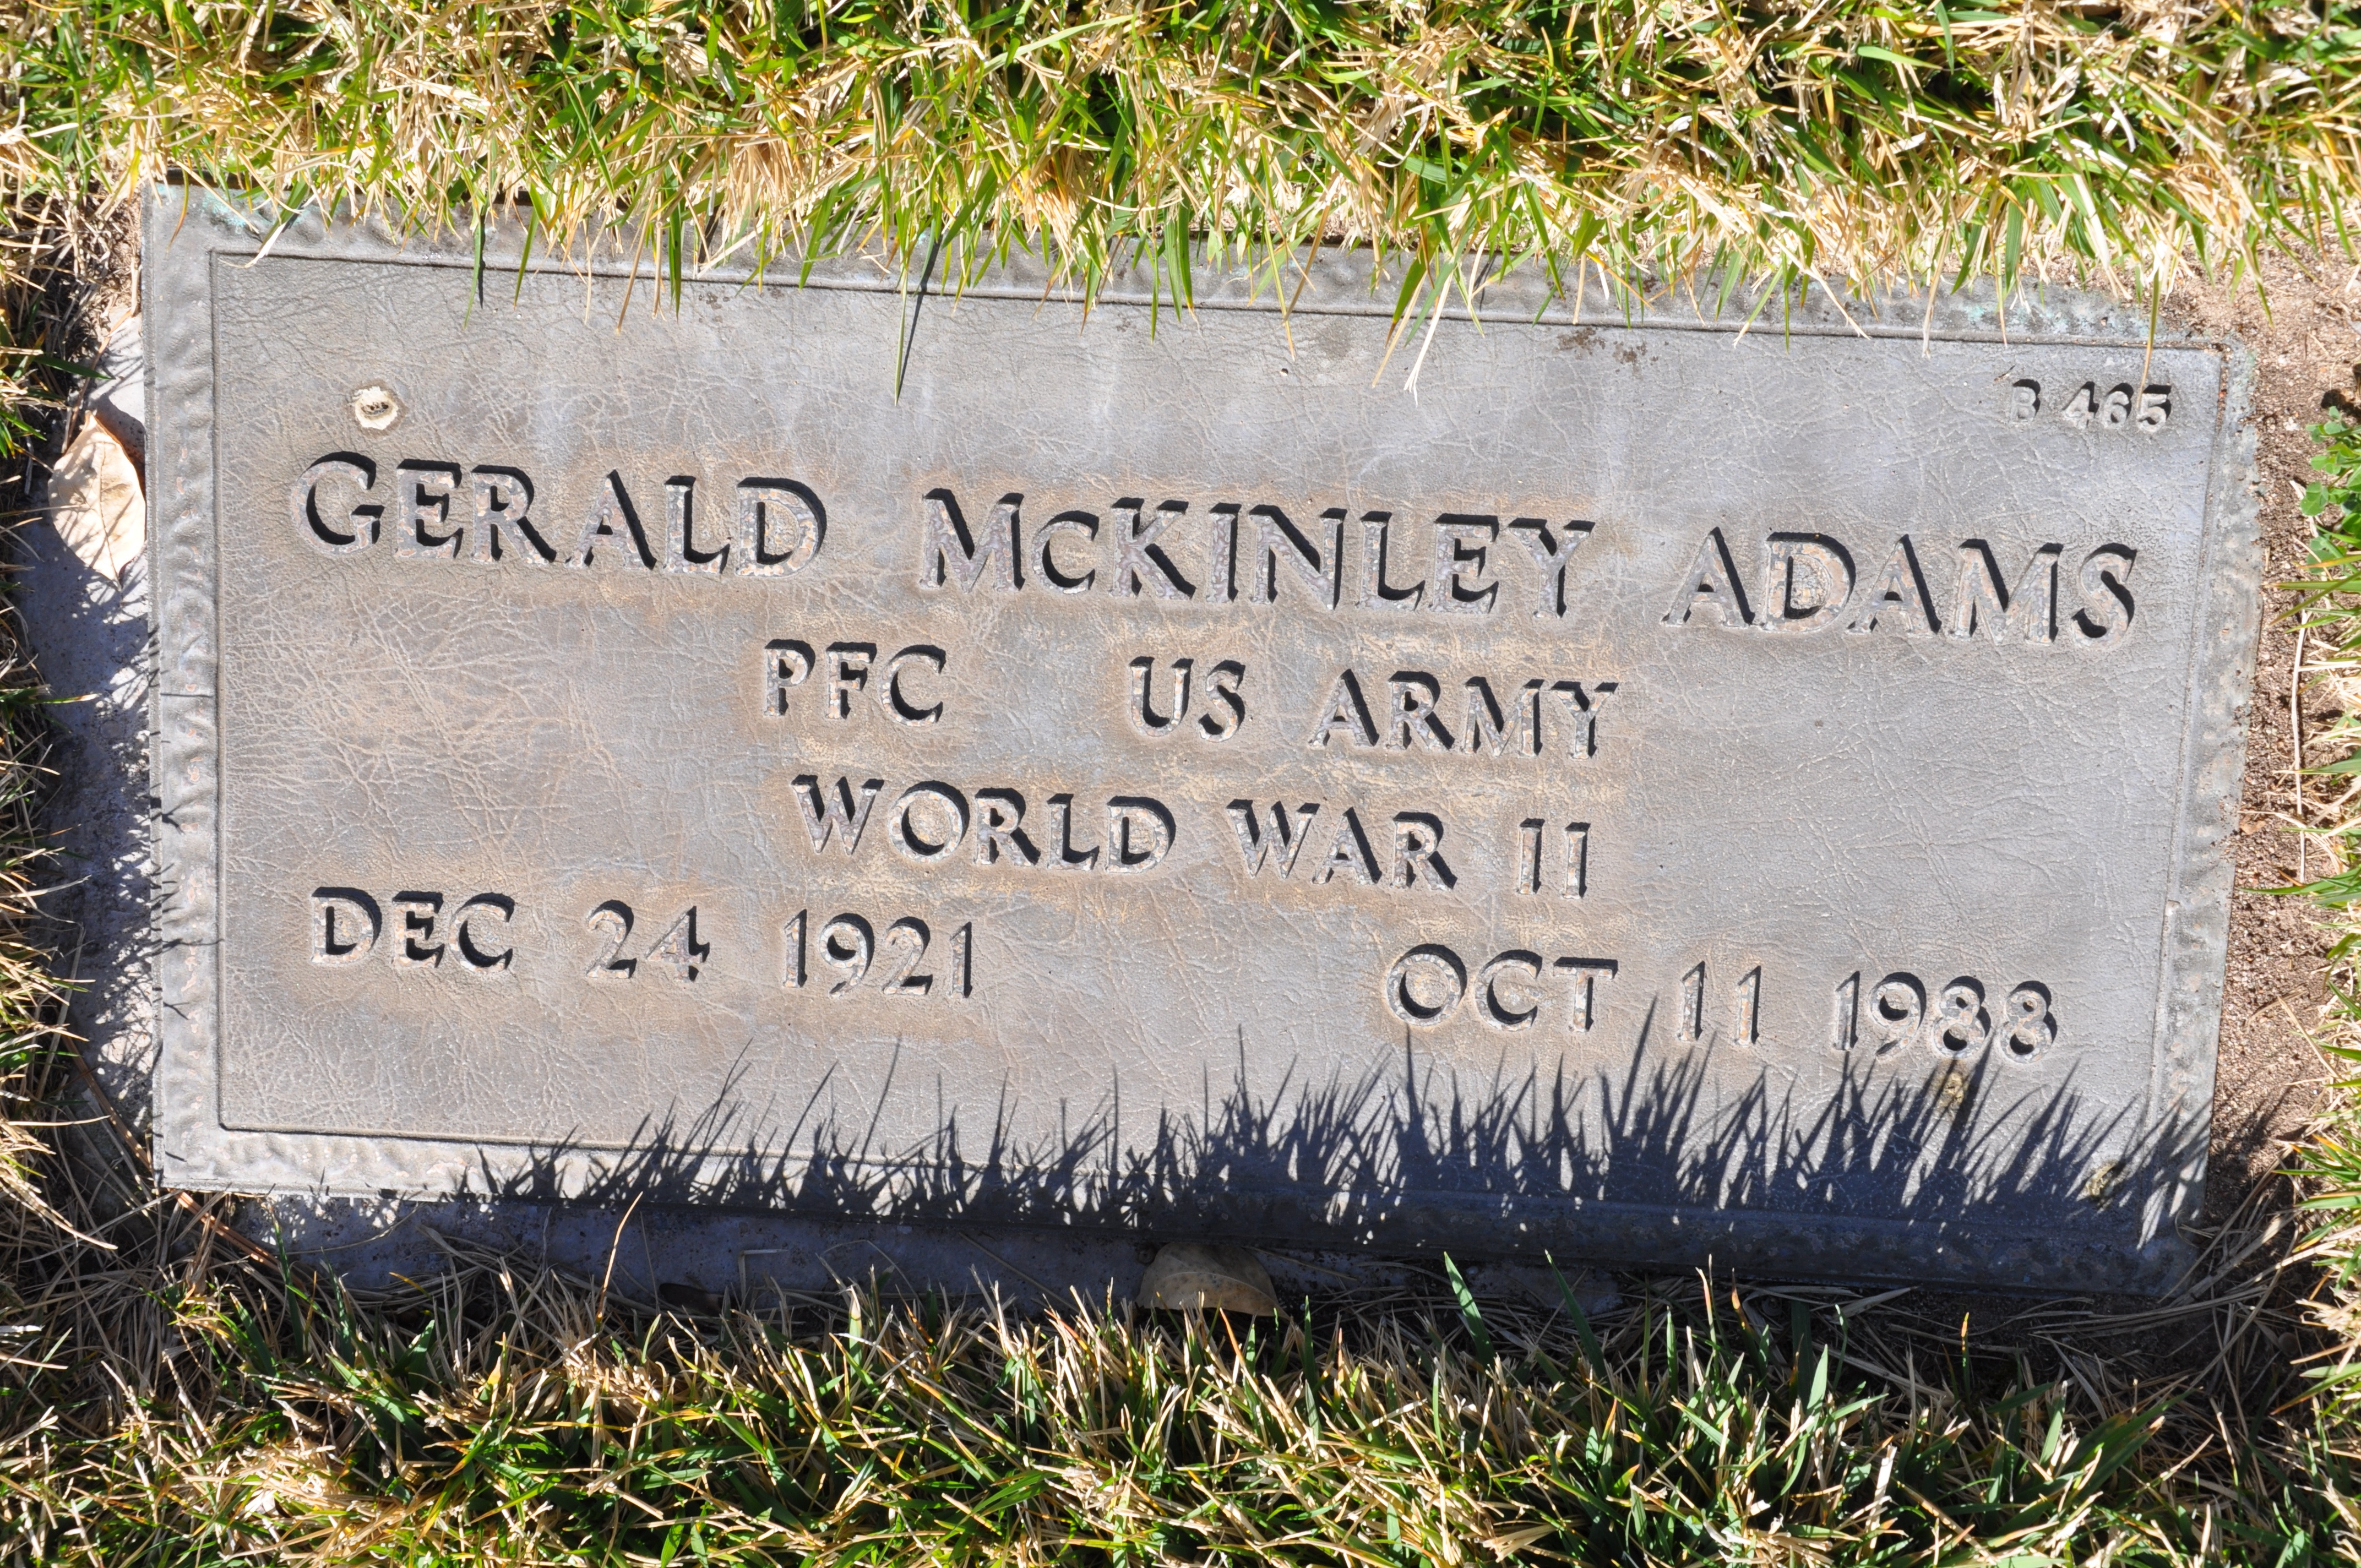 Gerald McKinley Adams